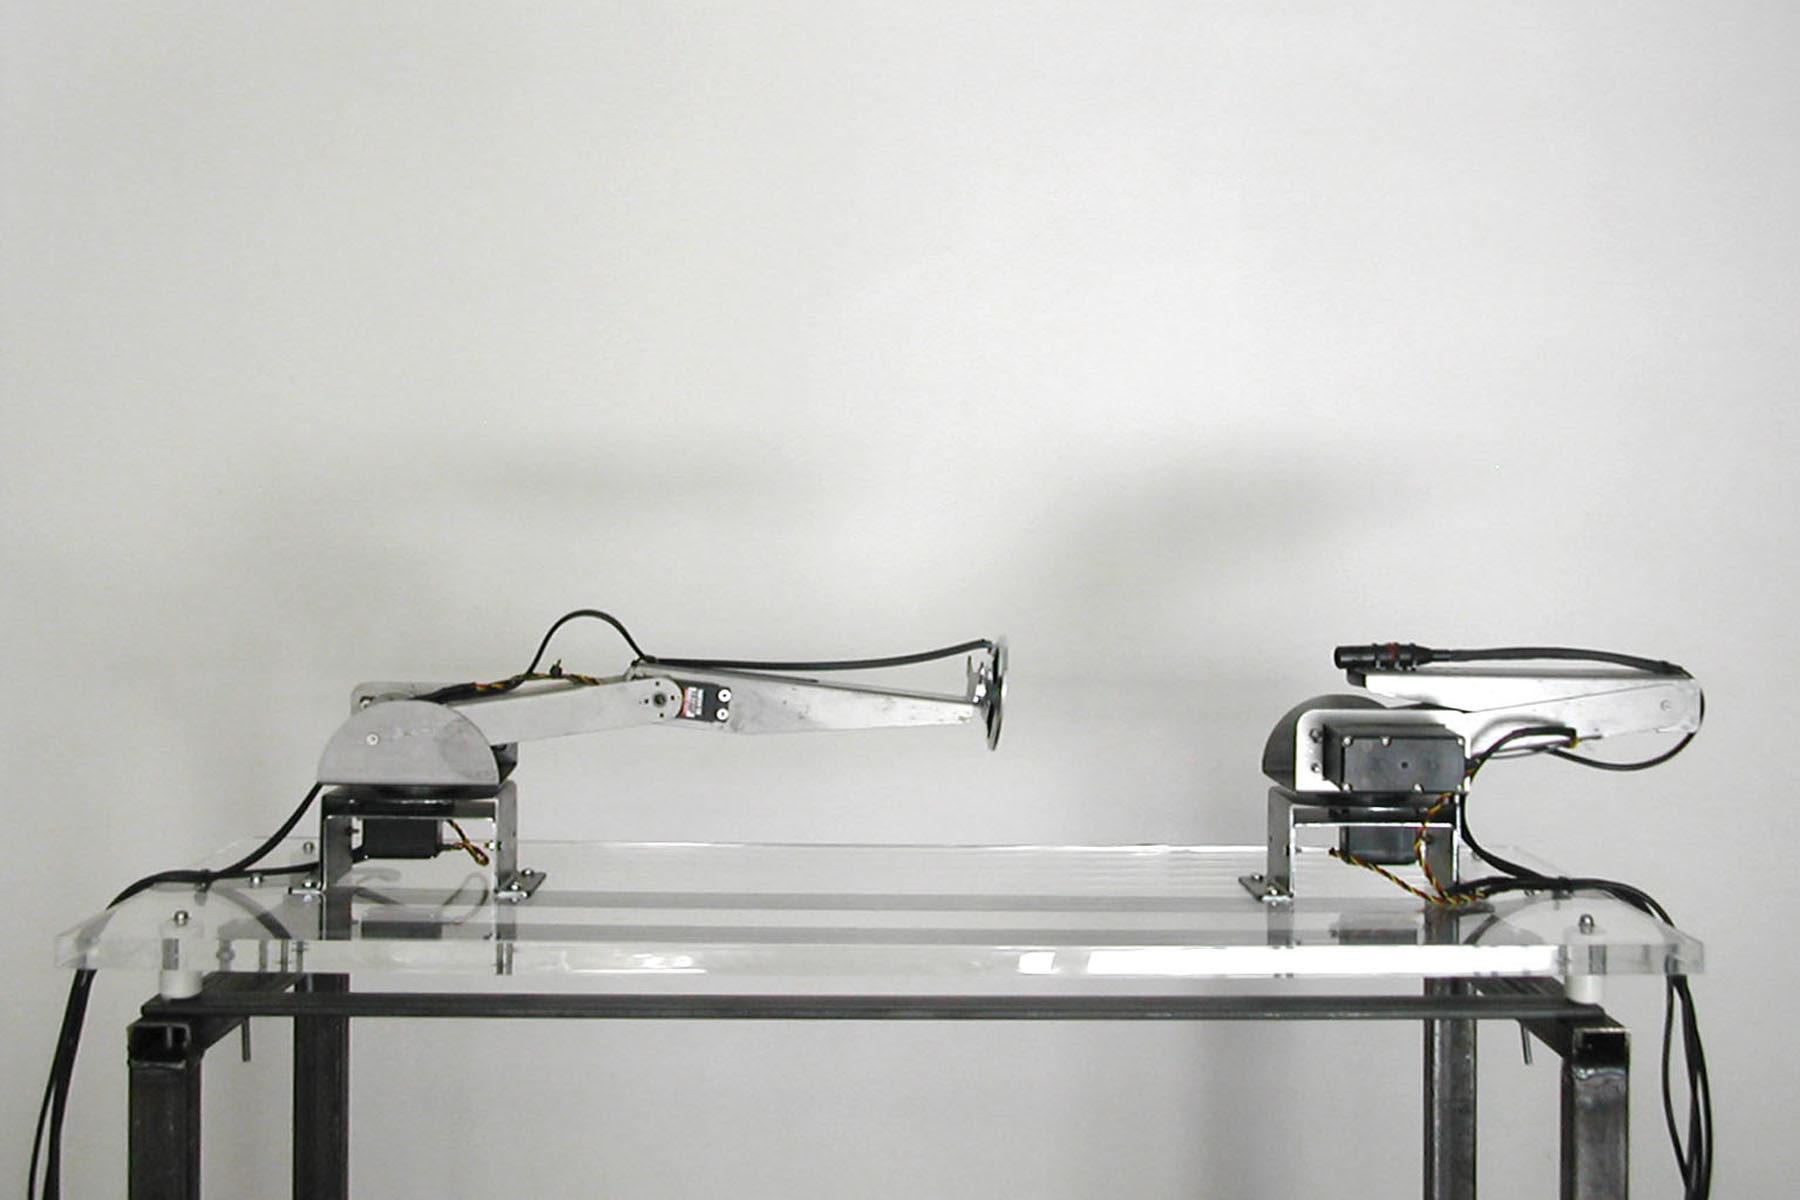 Roberto Pugliese, Equilibrium Variant, 2011, installation view at Galerie Mario Mazzoli, Berlin